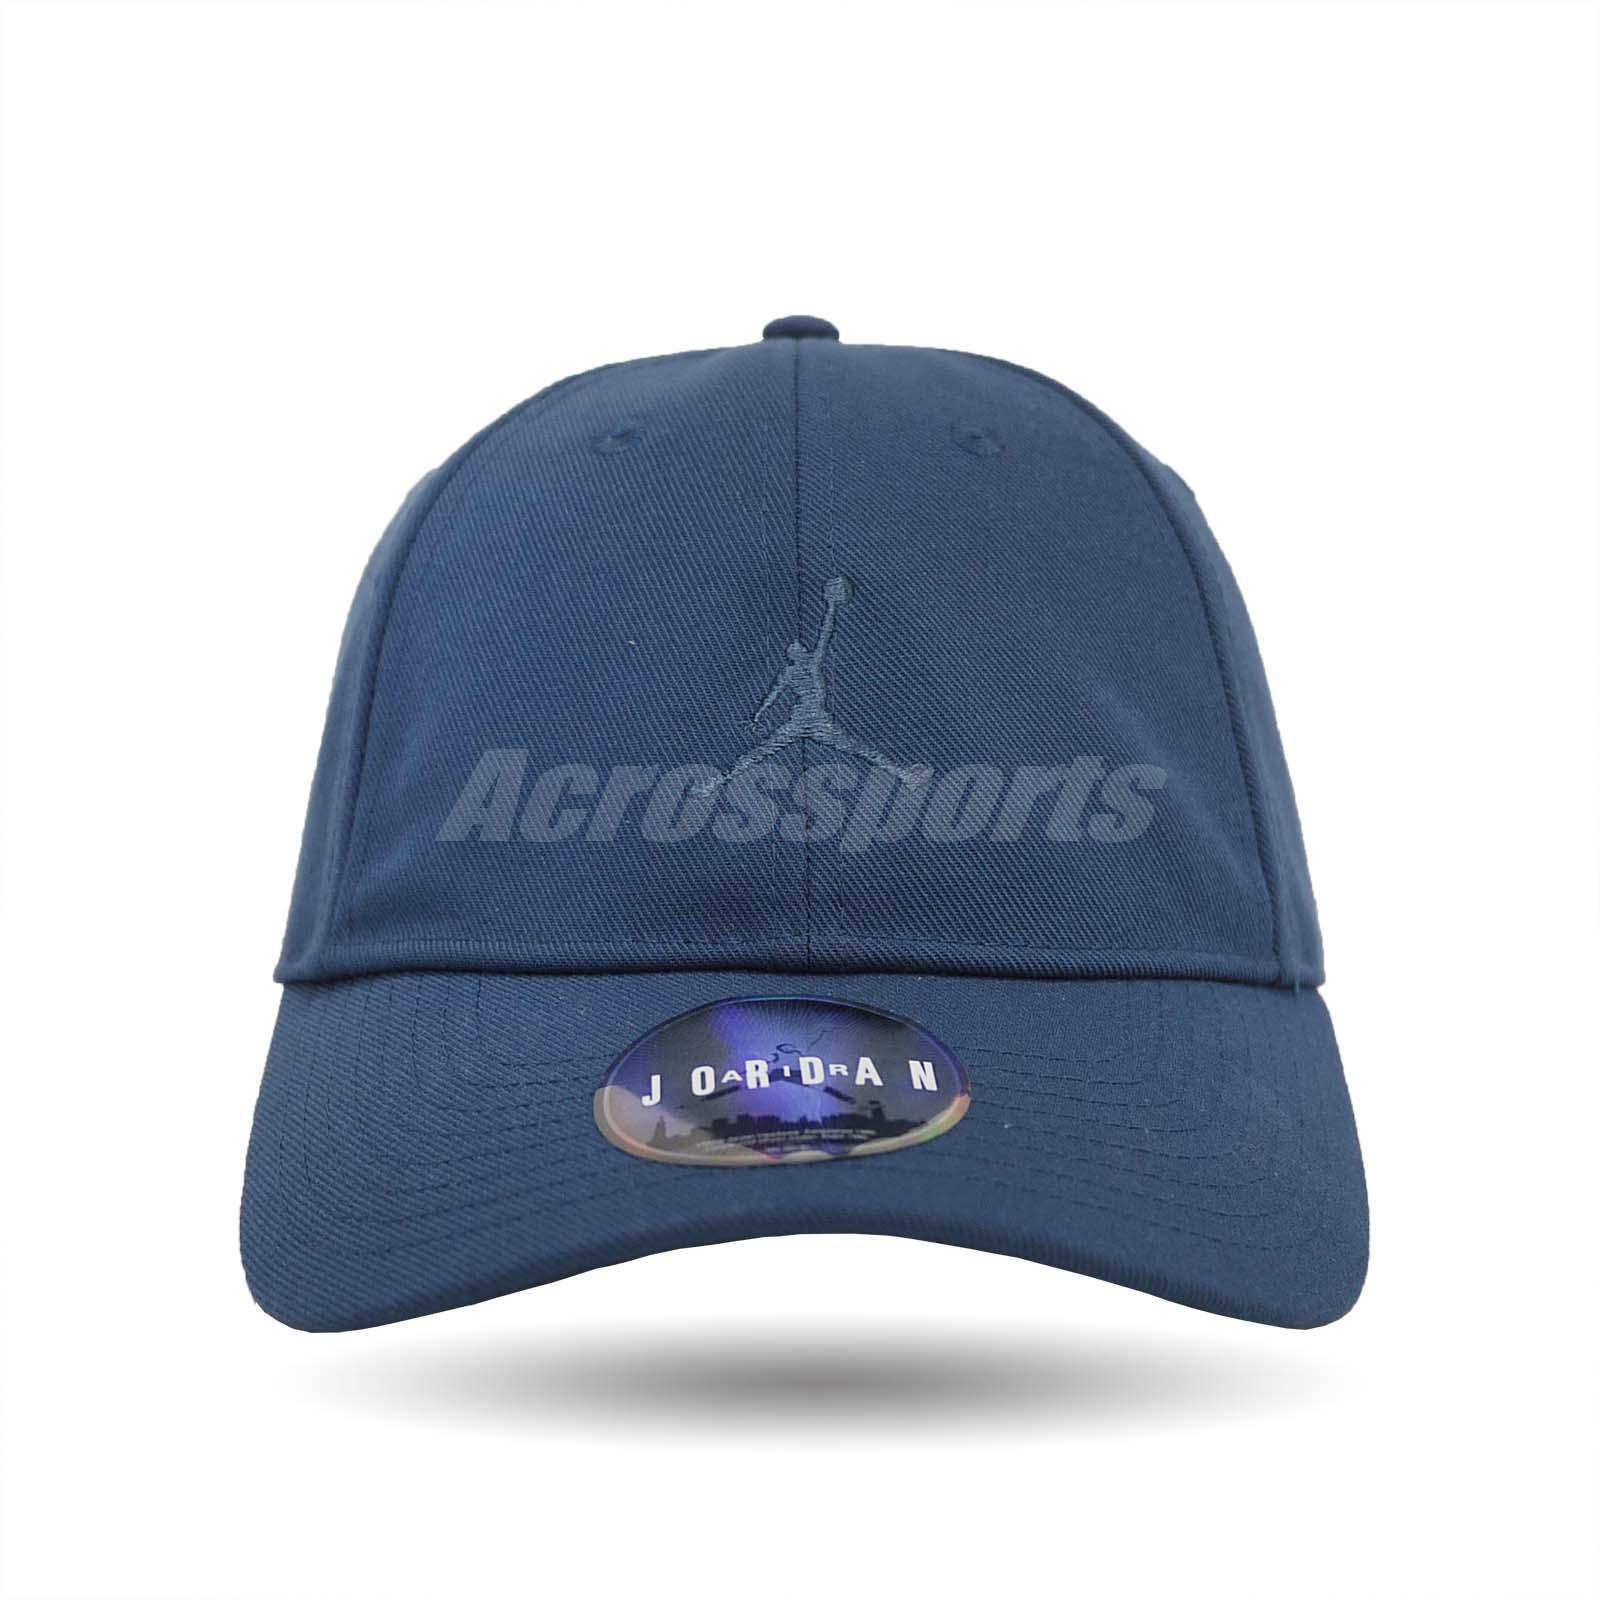 2a070197c8f Nike Jordan Jumpman Floppy H86 Adjustable Hat Heritage Gym Cap Blue  847143-414